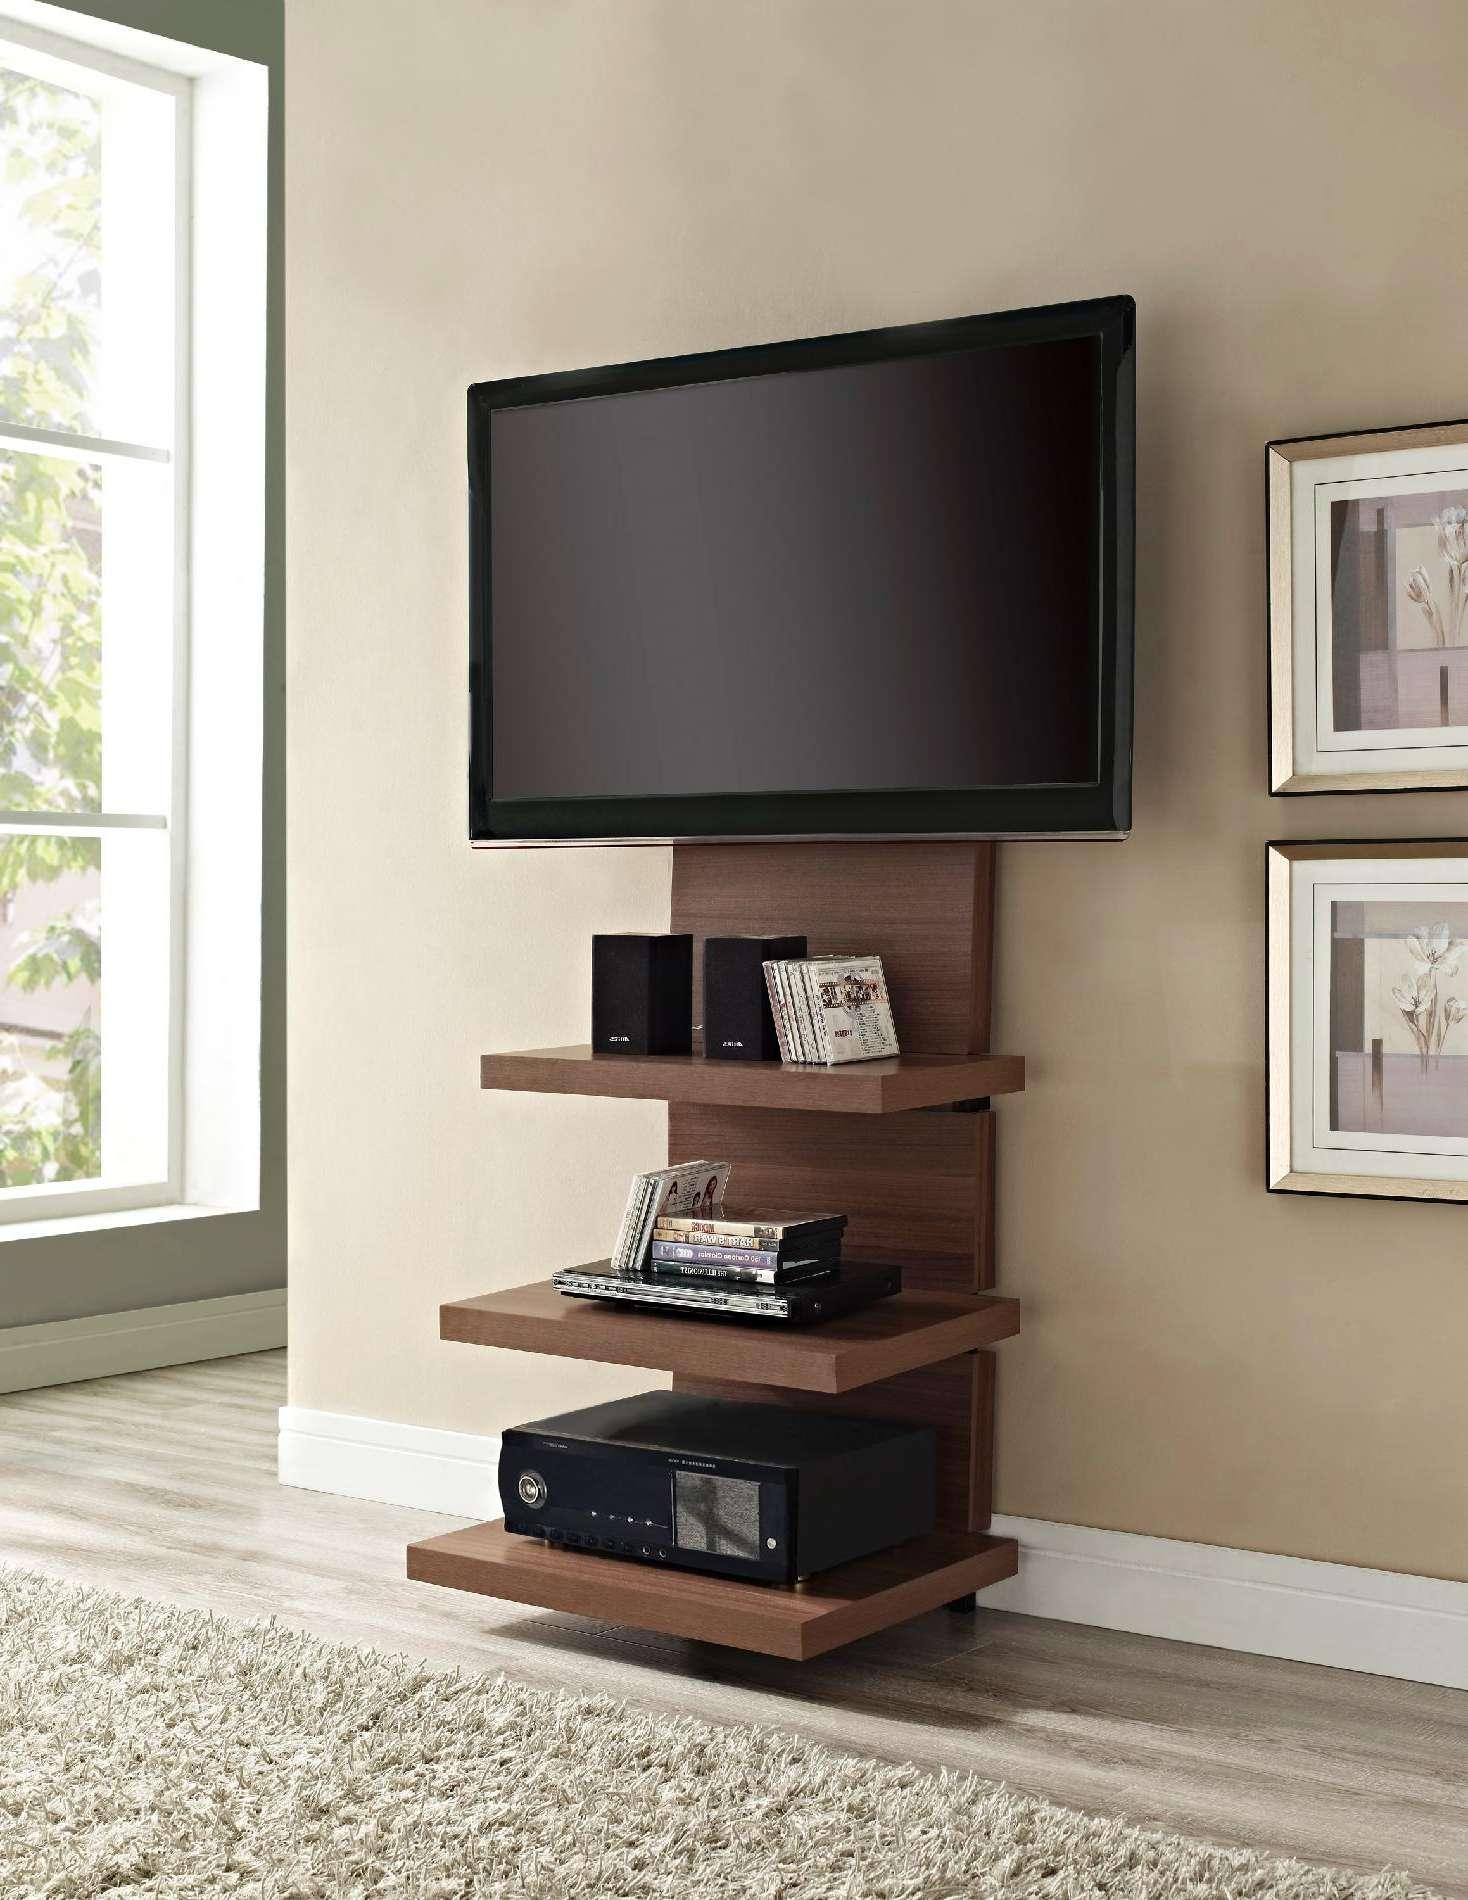 Bedroom Design : Marvelous Entertainment Center Corner Tv Unit With Sleek Tv Stands (View 8 of 15)